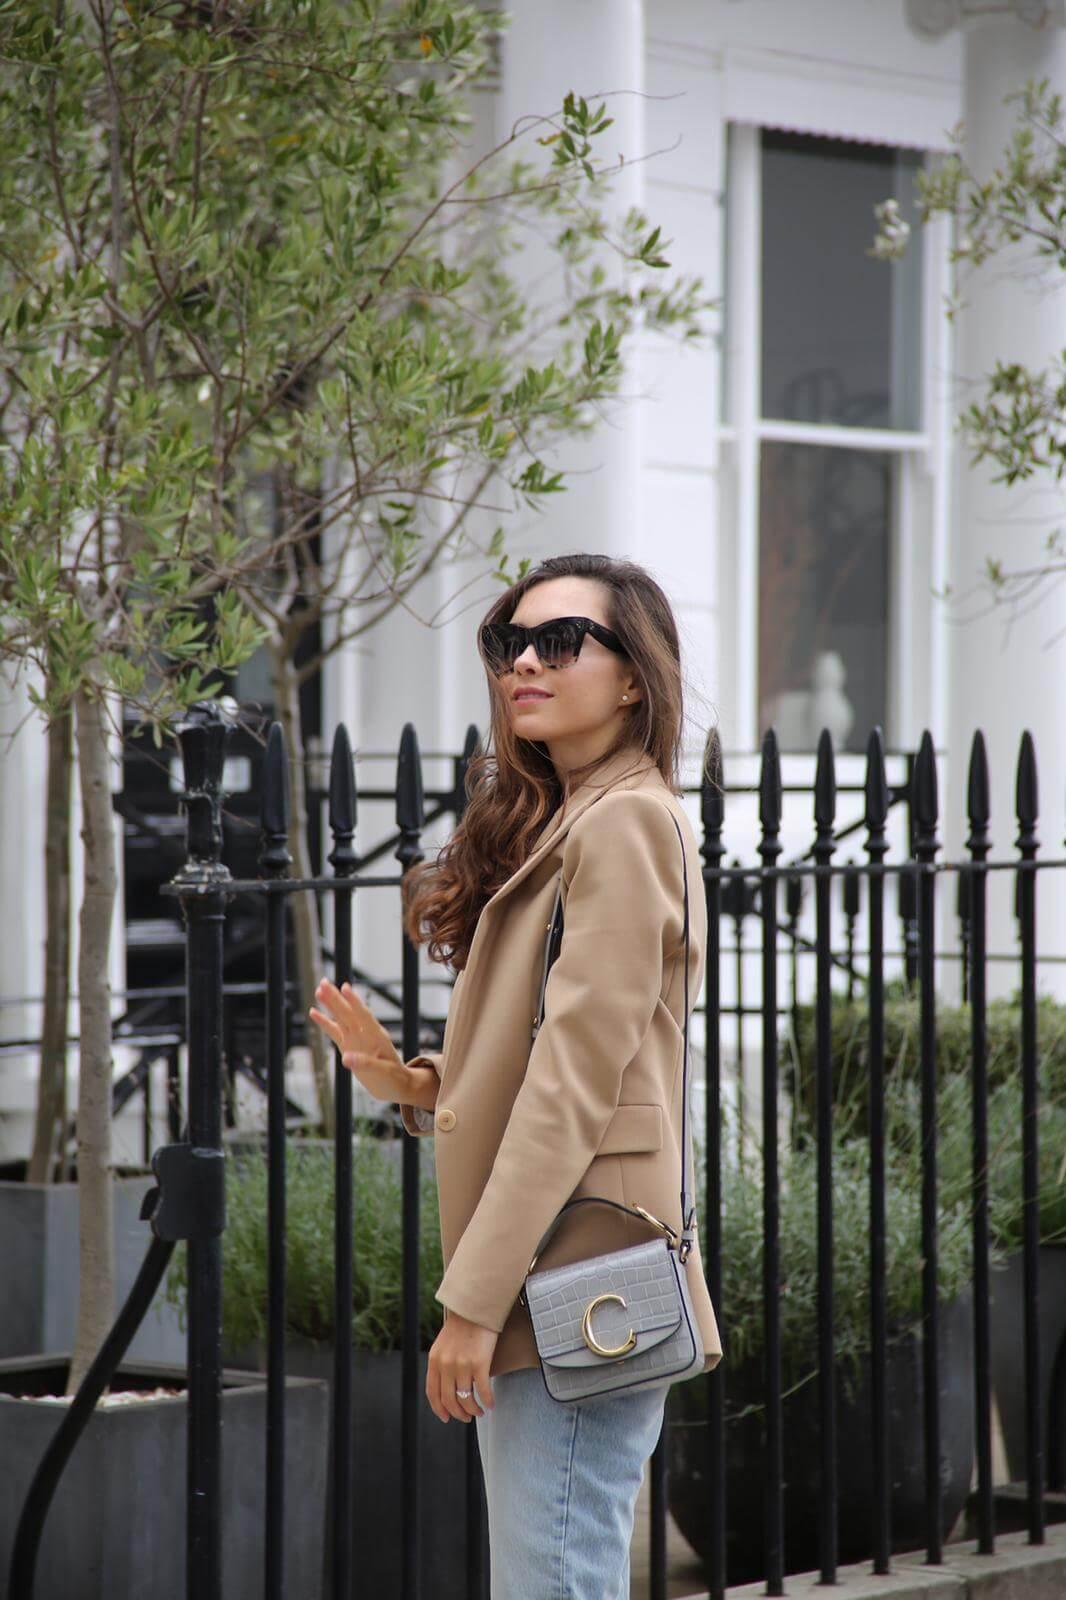 wardrobe makeover services in UK and Dubai by Fashion stylist Deni Kiro